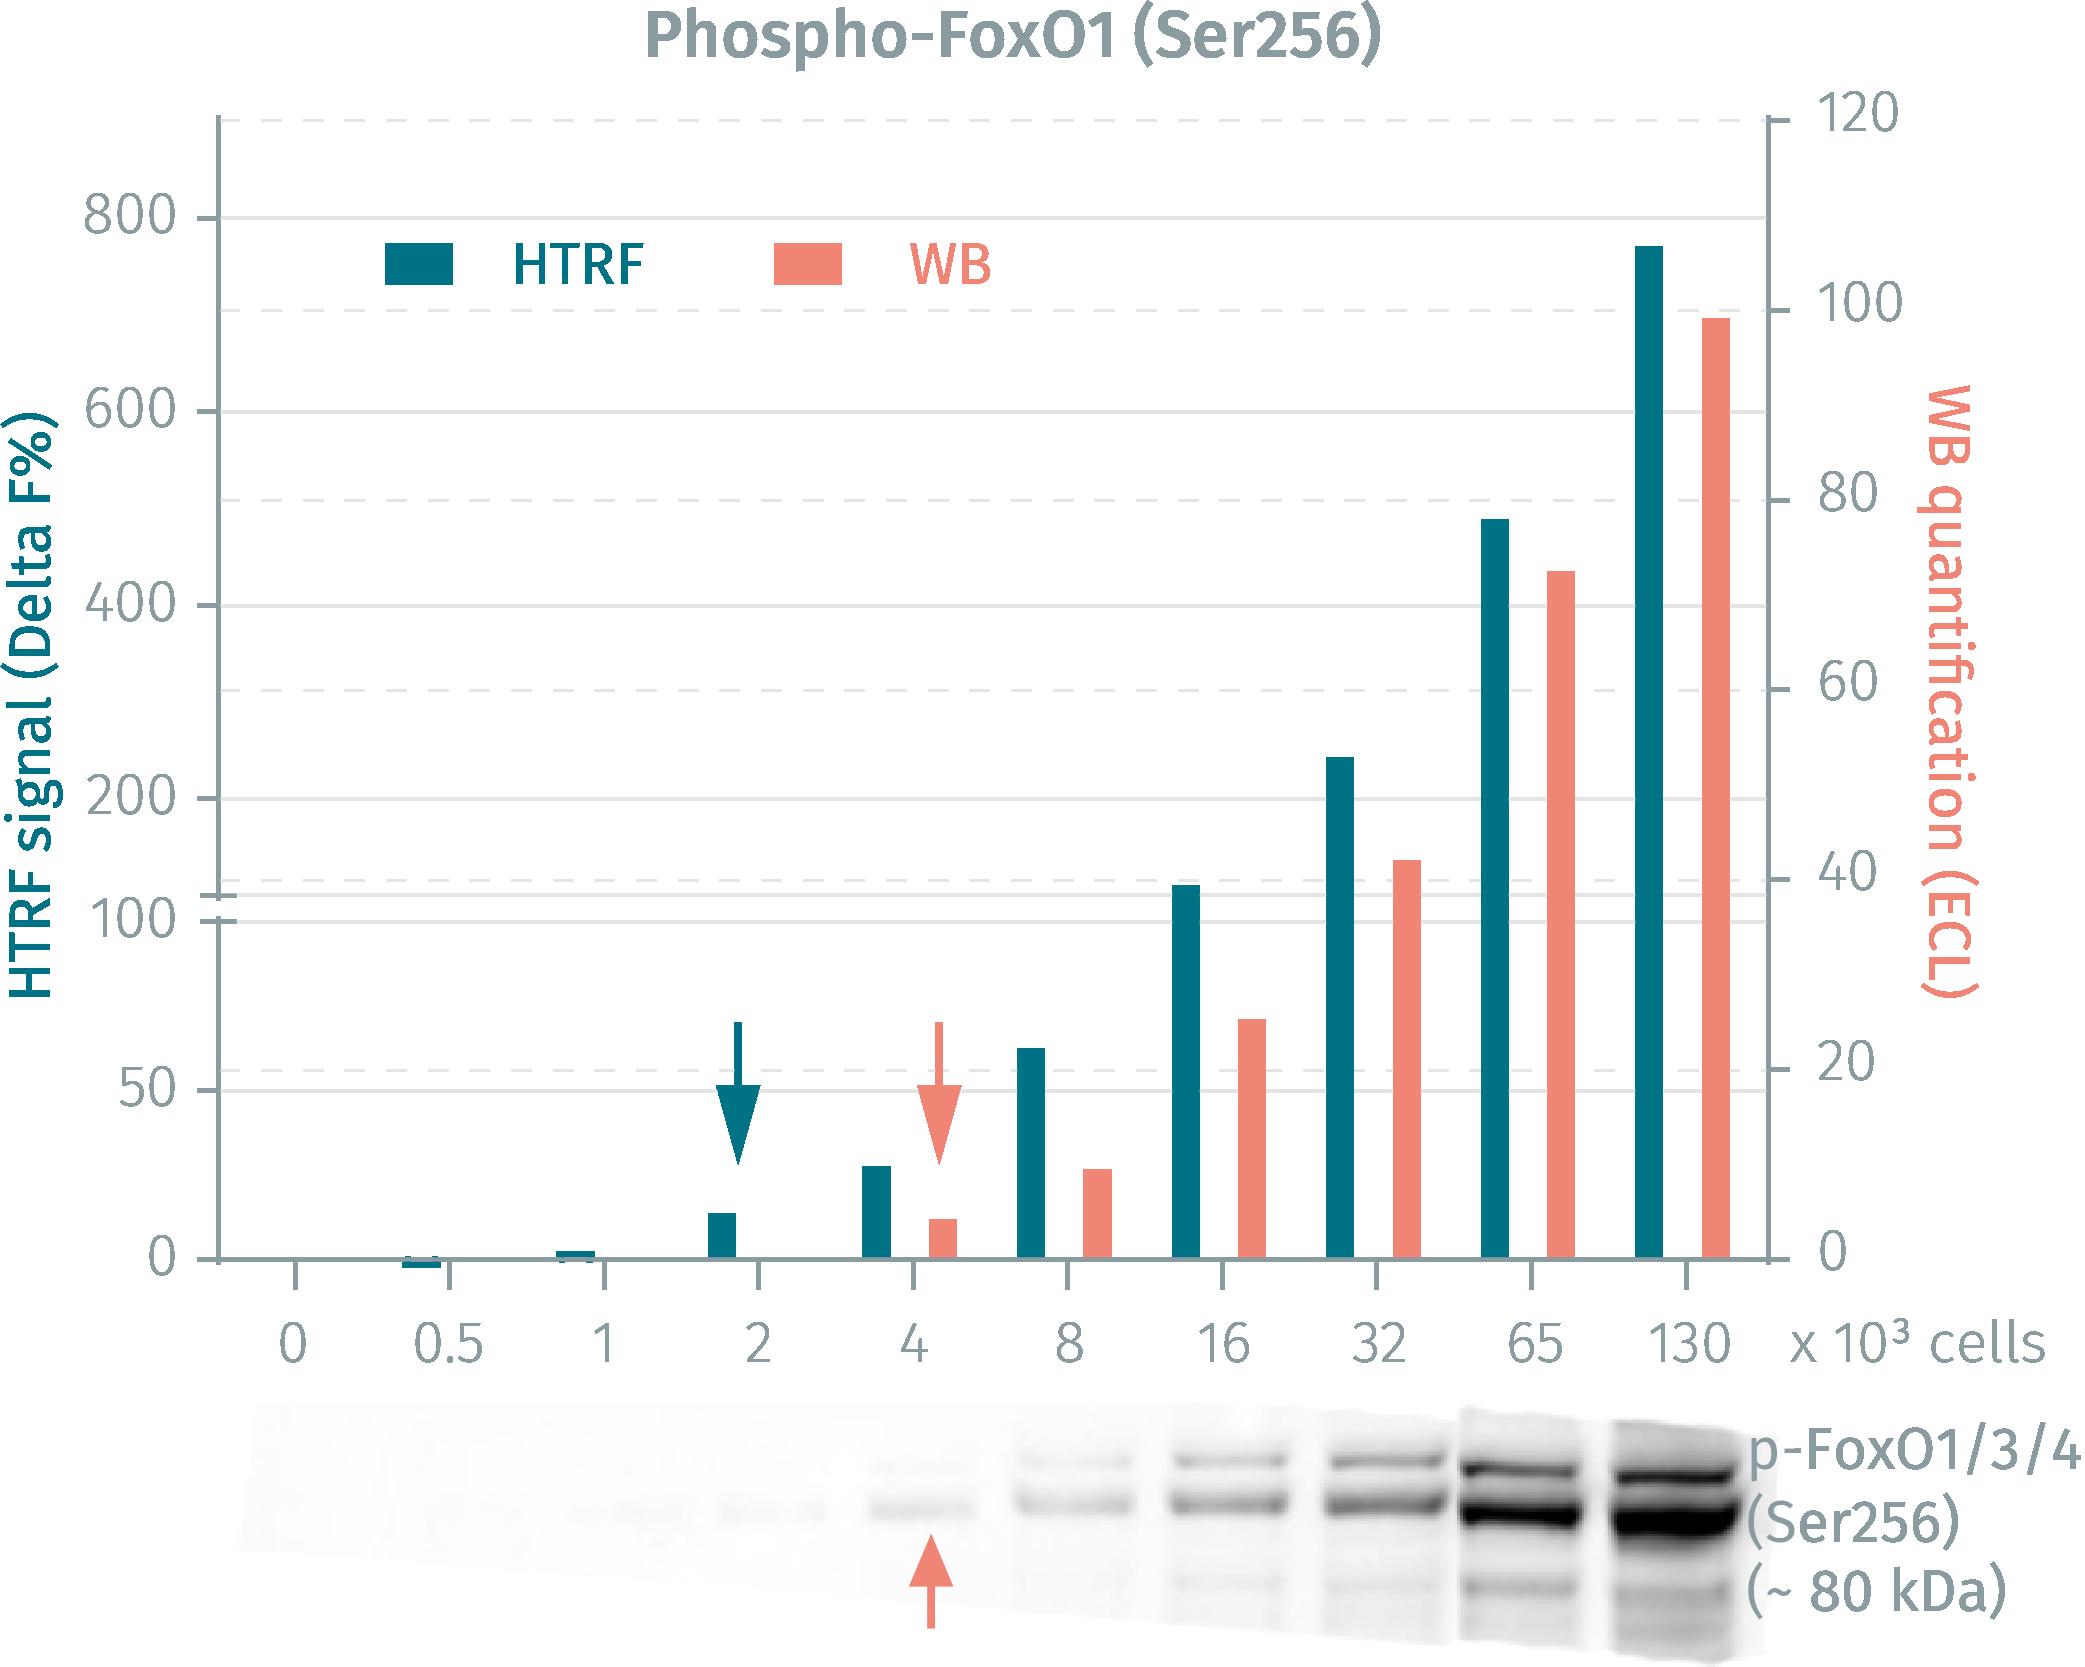 HTRF phospho-FoxO1 assay vs WB on human HEK293 cells